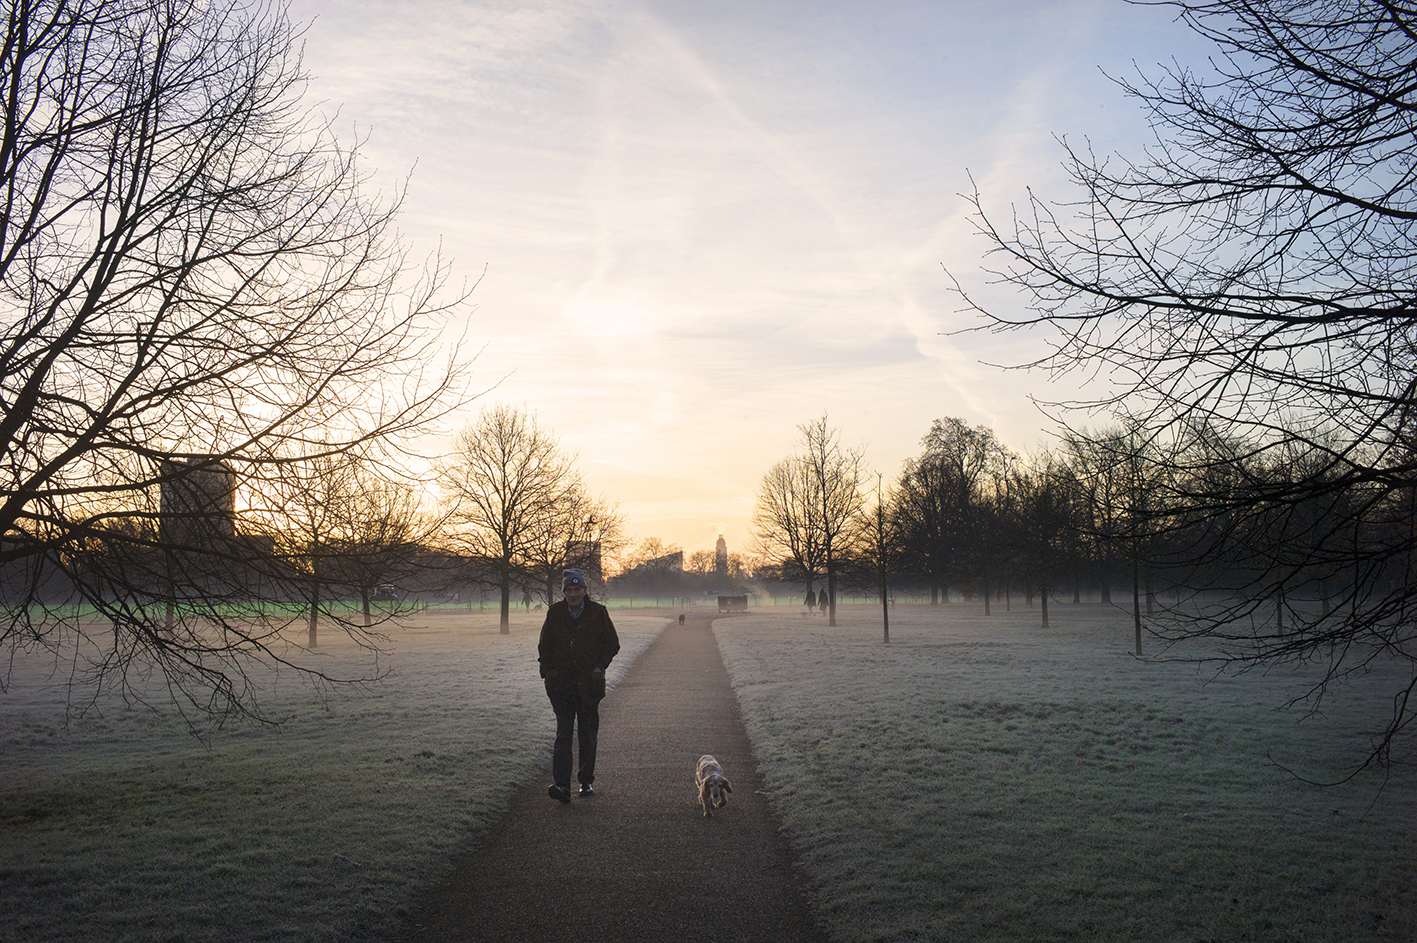 「Hyde park」